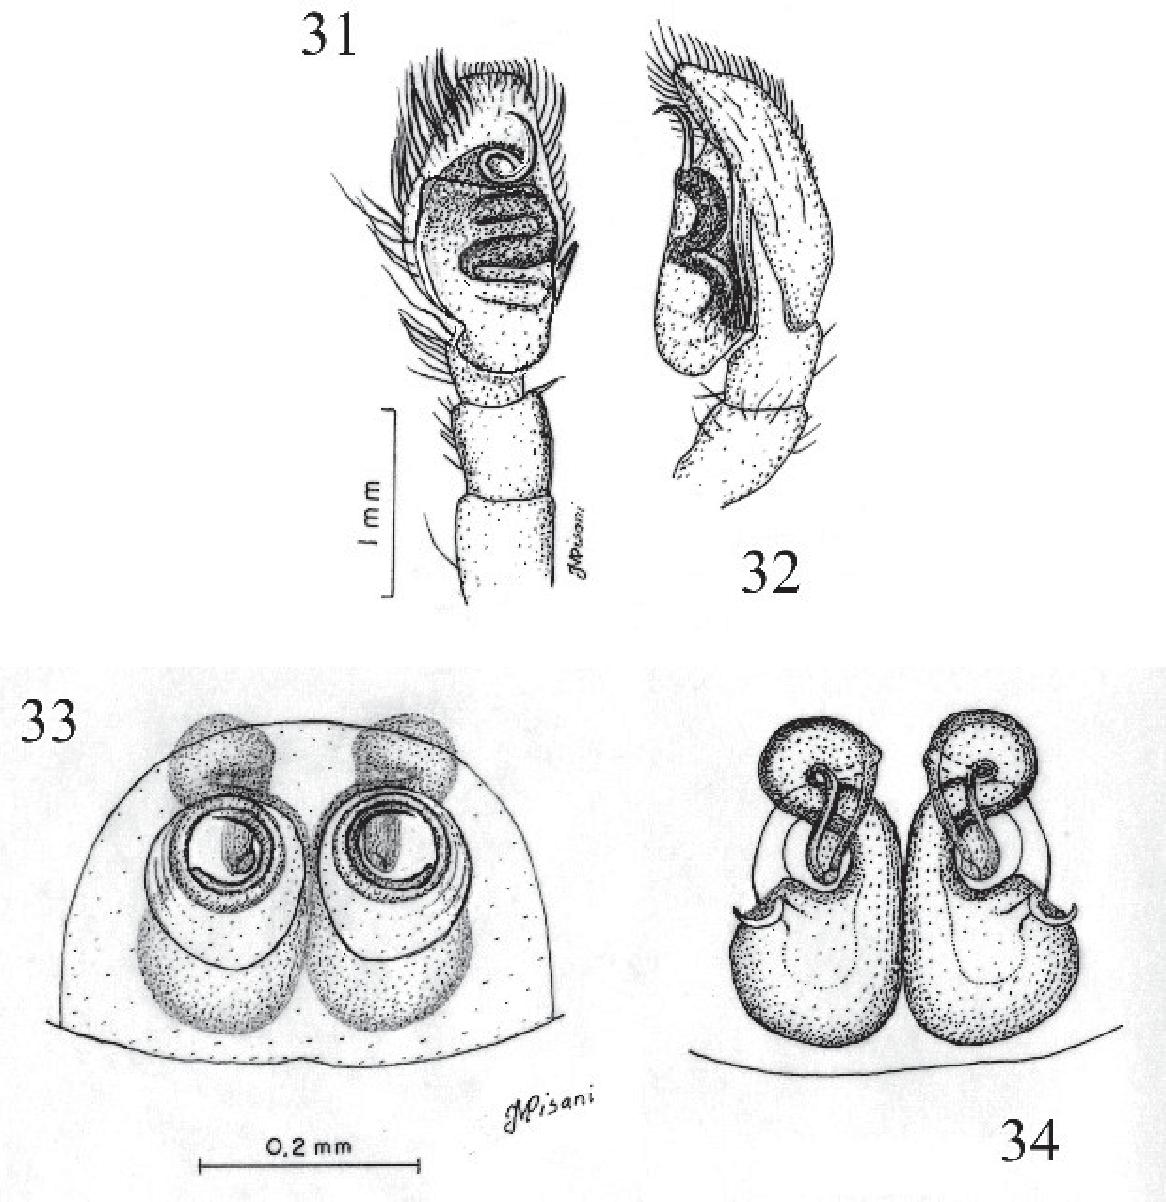 figure 31-34